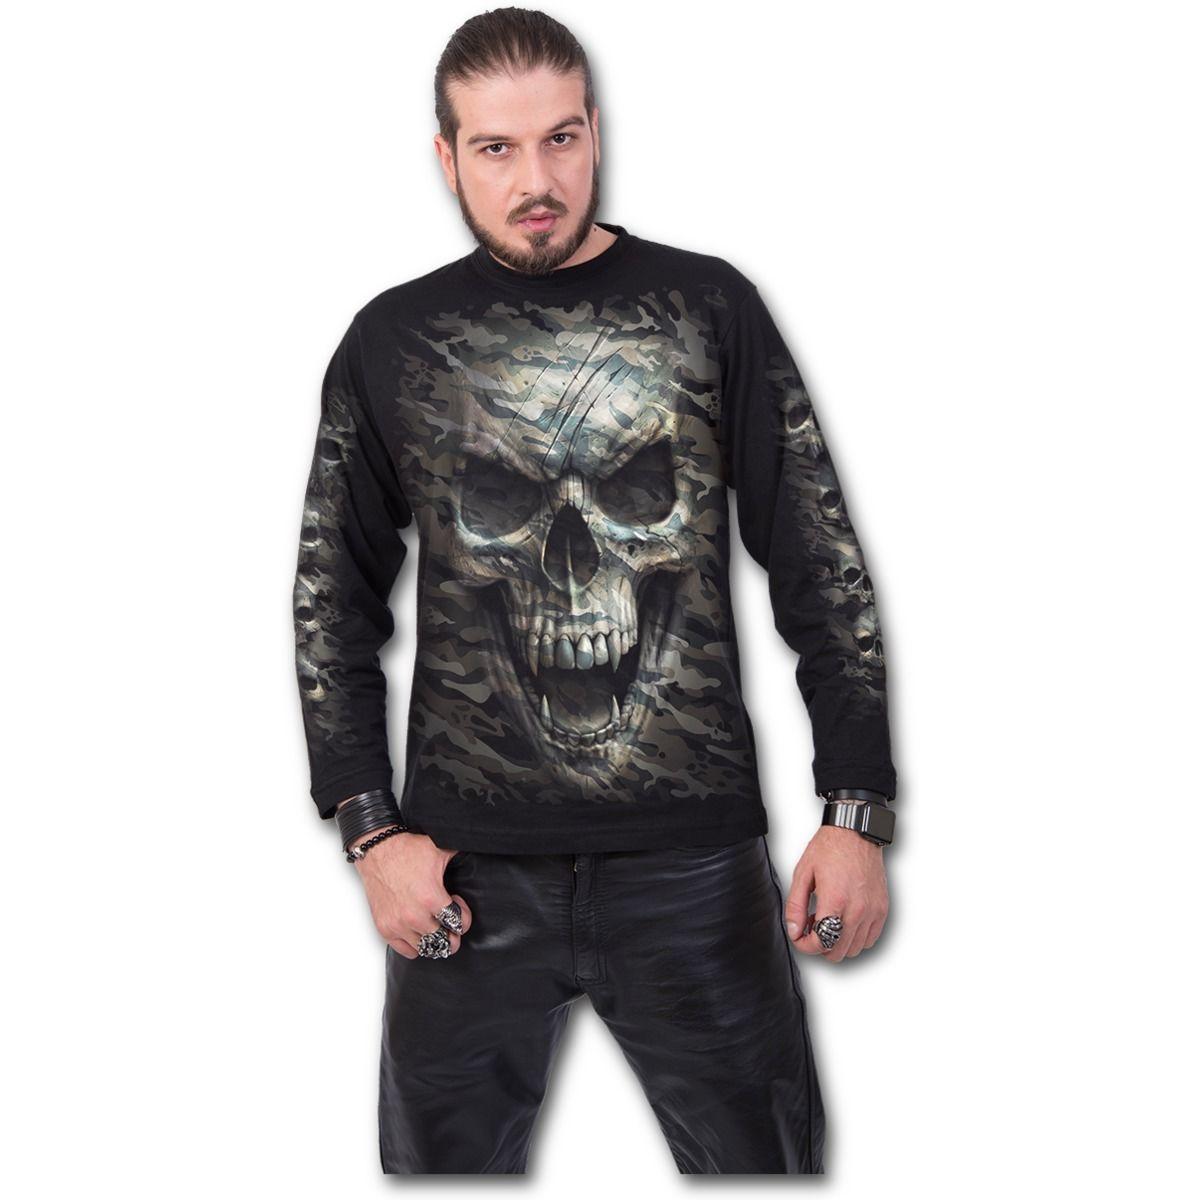 rebelsmarket_men_s_new_army_skull_long_sleeve_black_t_shirt_t_shirts_2.jpg